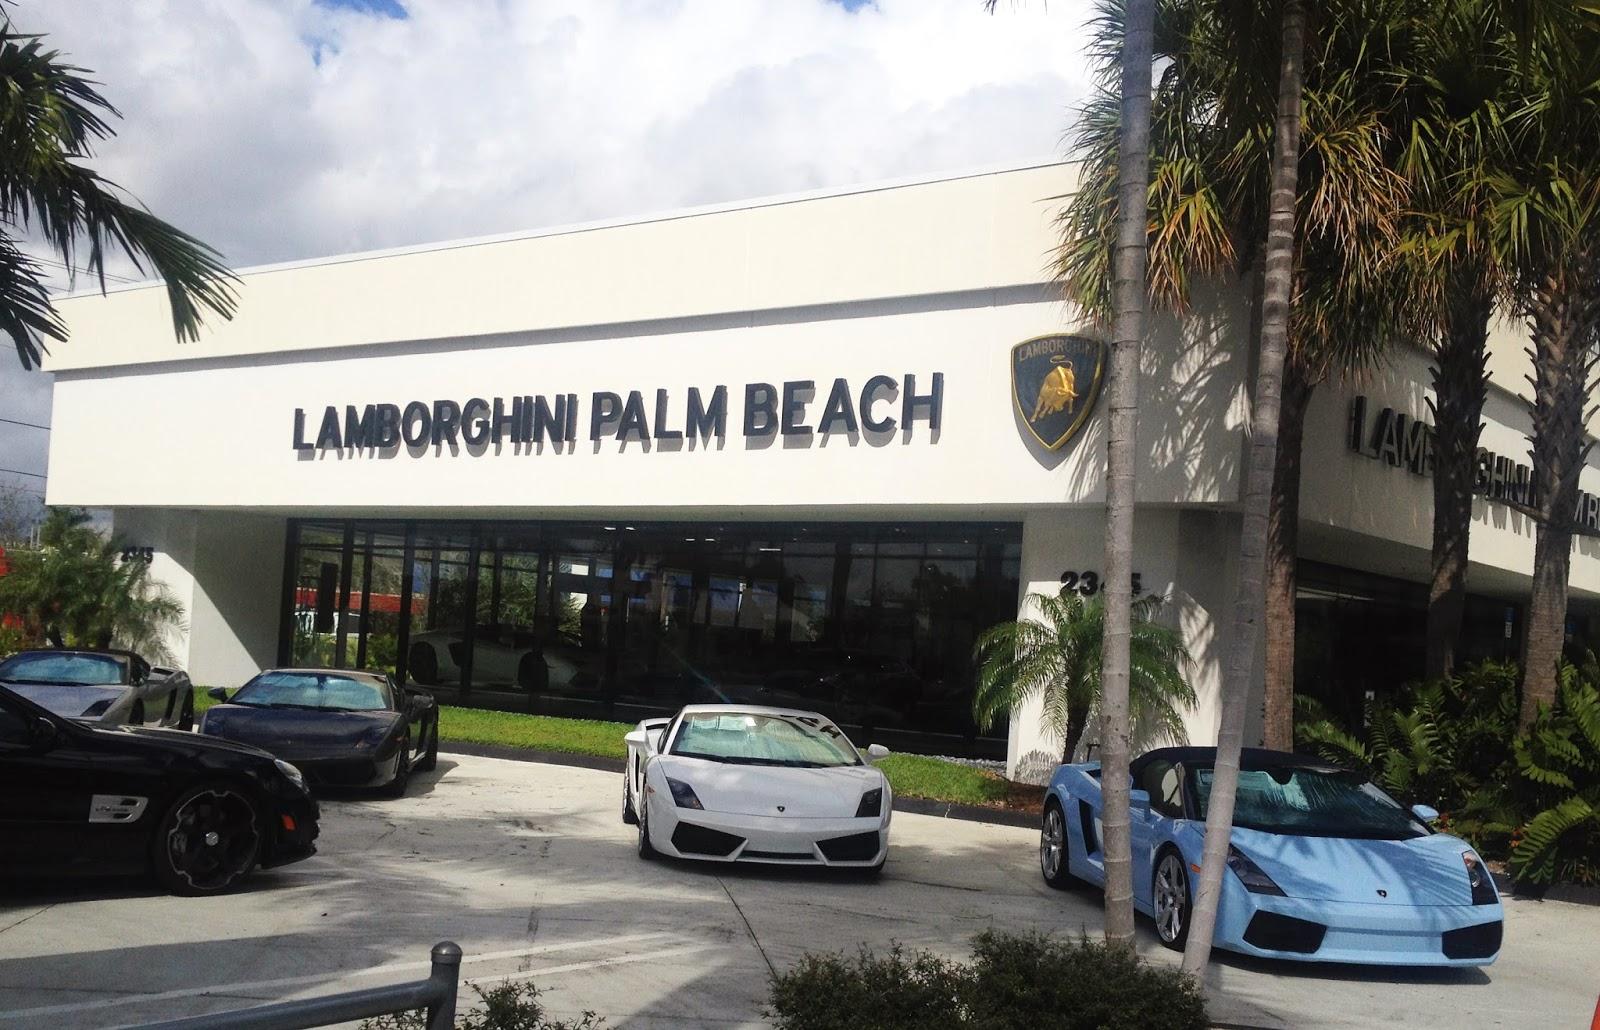 Used daytona luxury beach spanos cars oursongfortoday for Spanos motors daytona beach